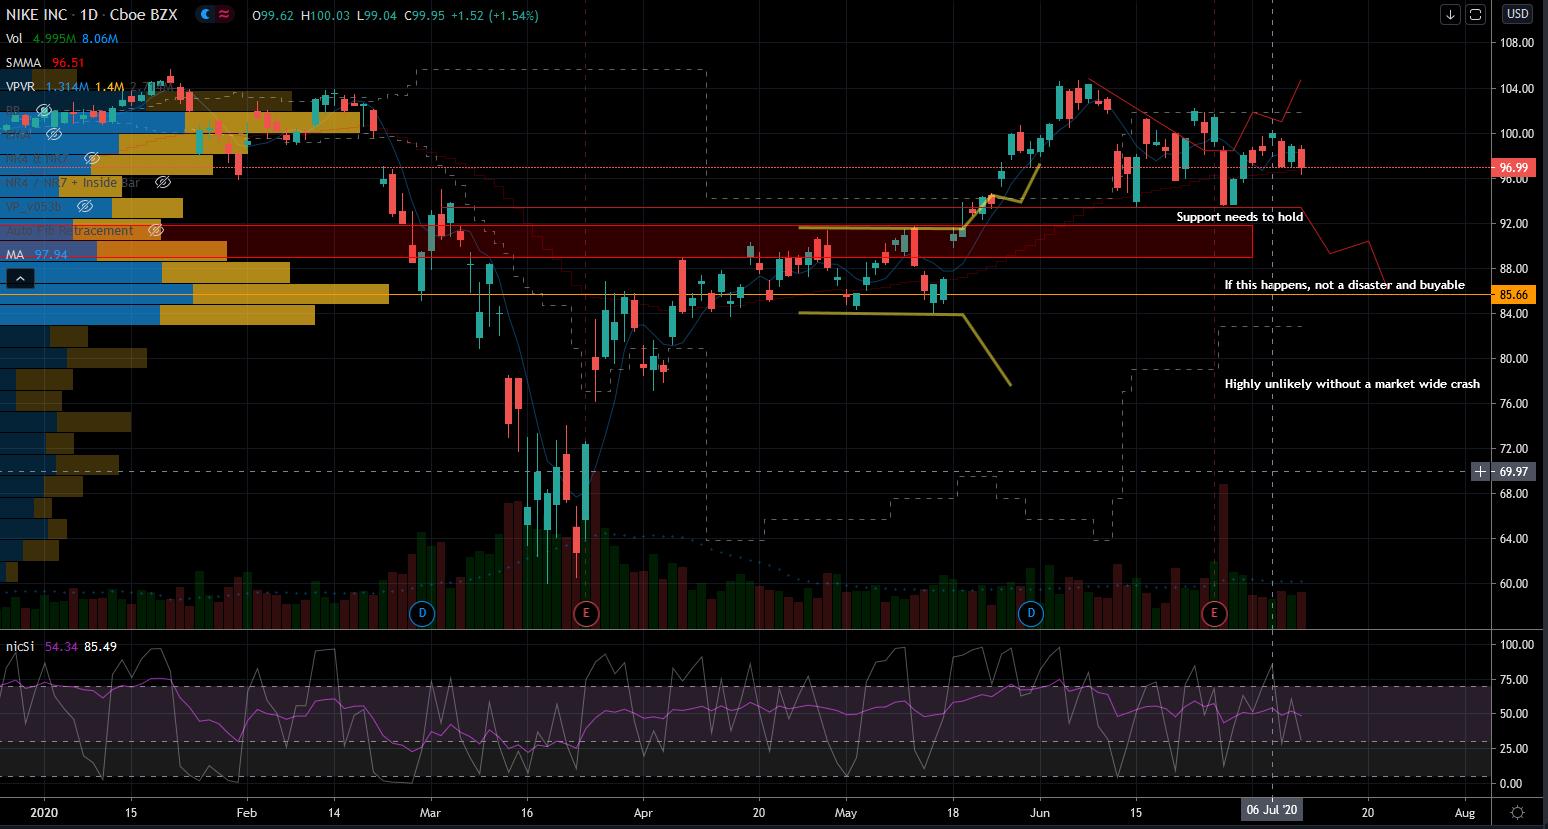 Nike Stock (NKE) Chart to Show Support Below